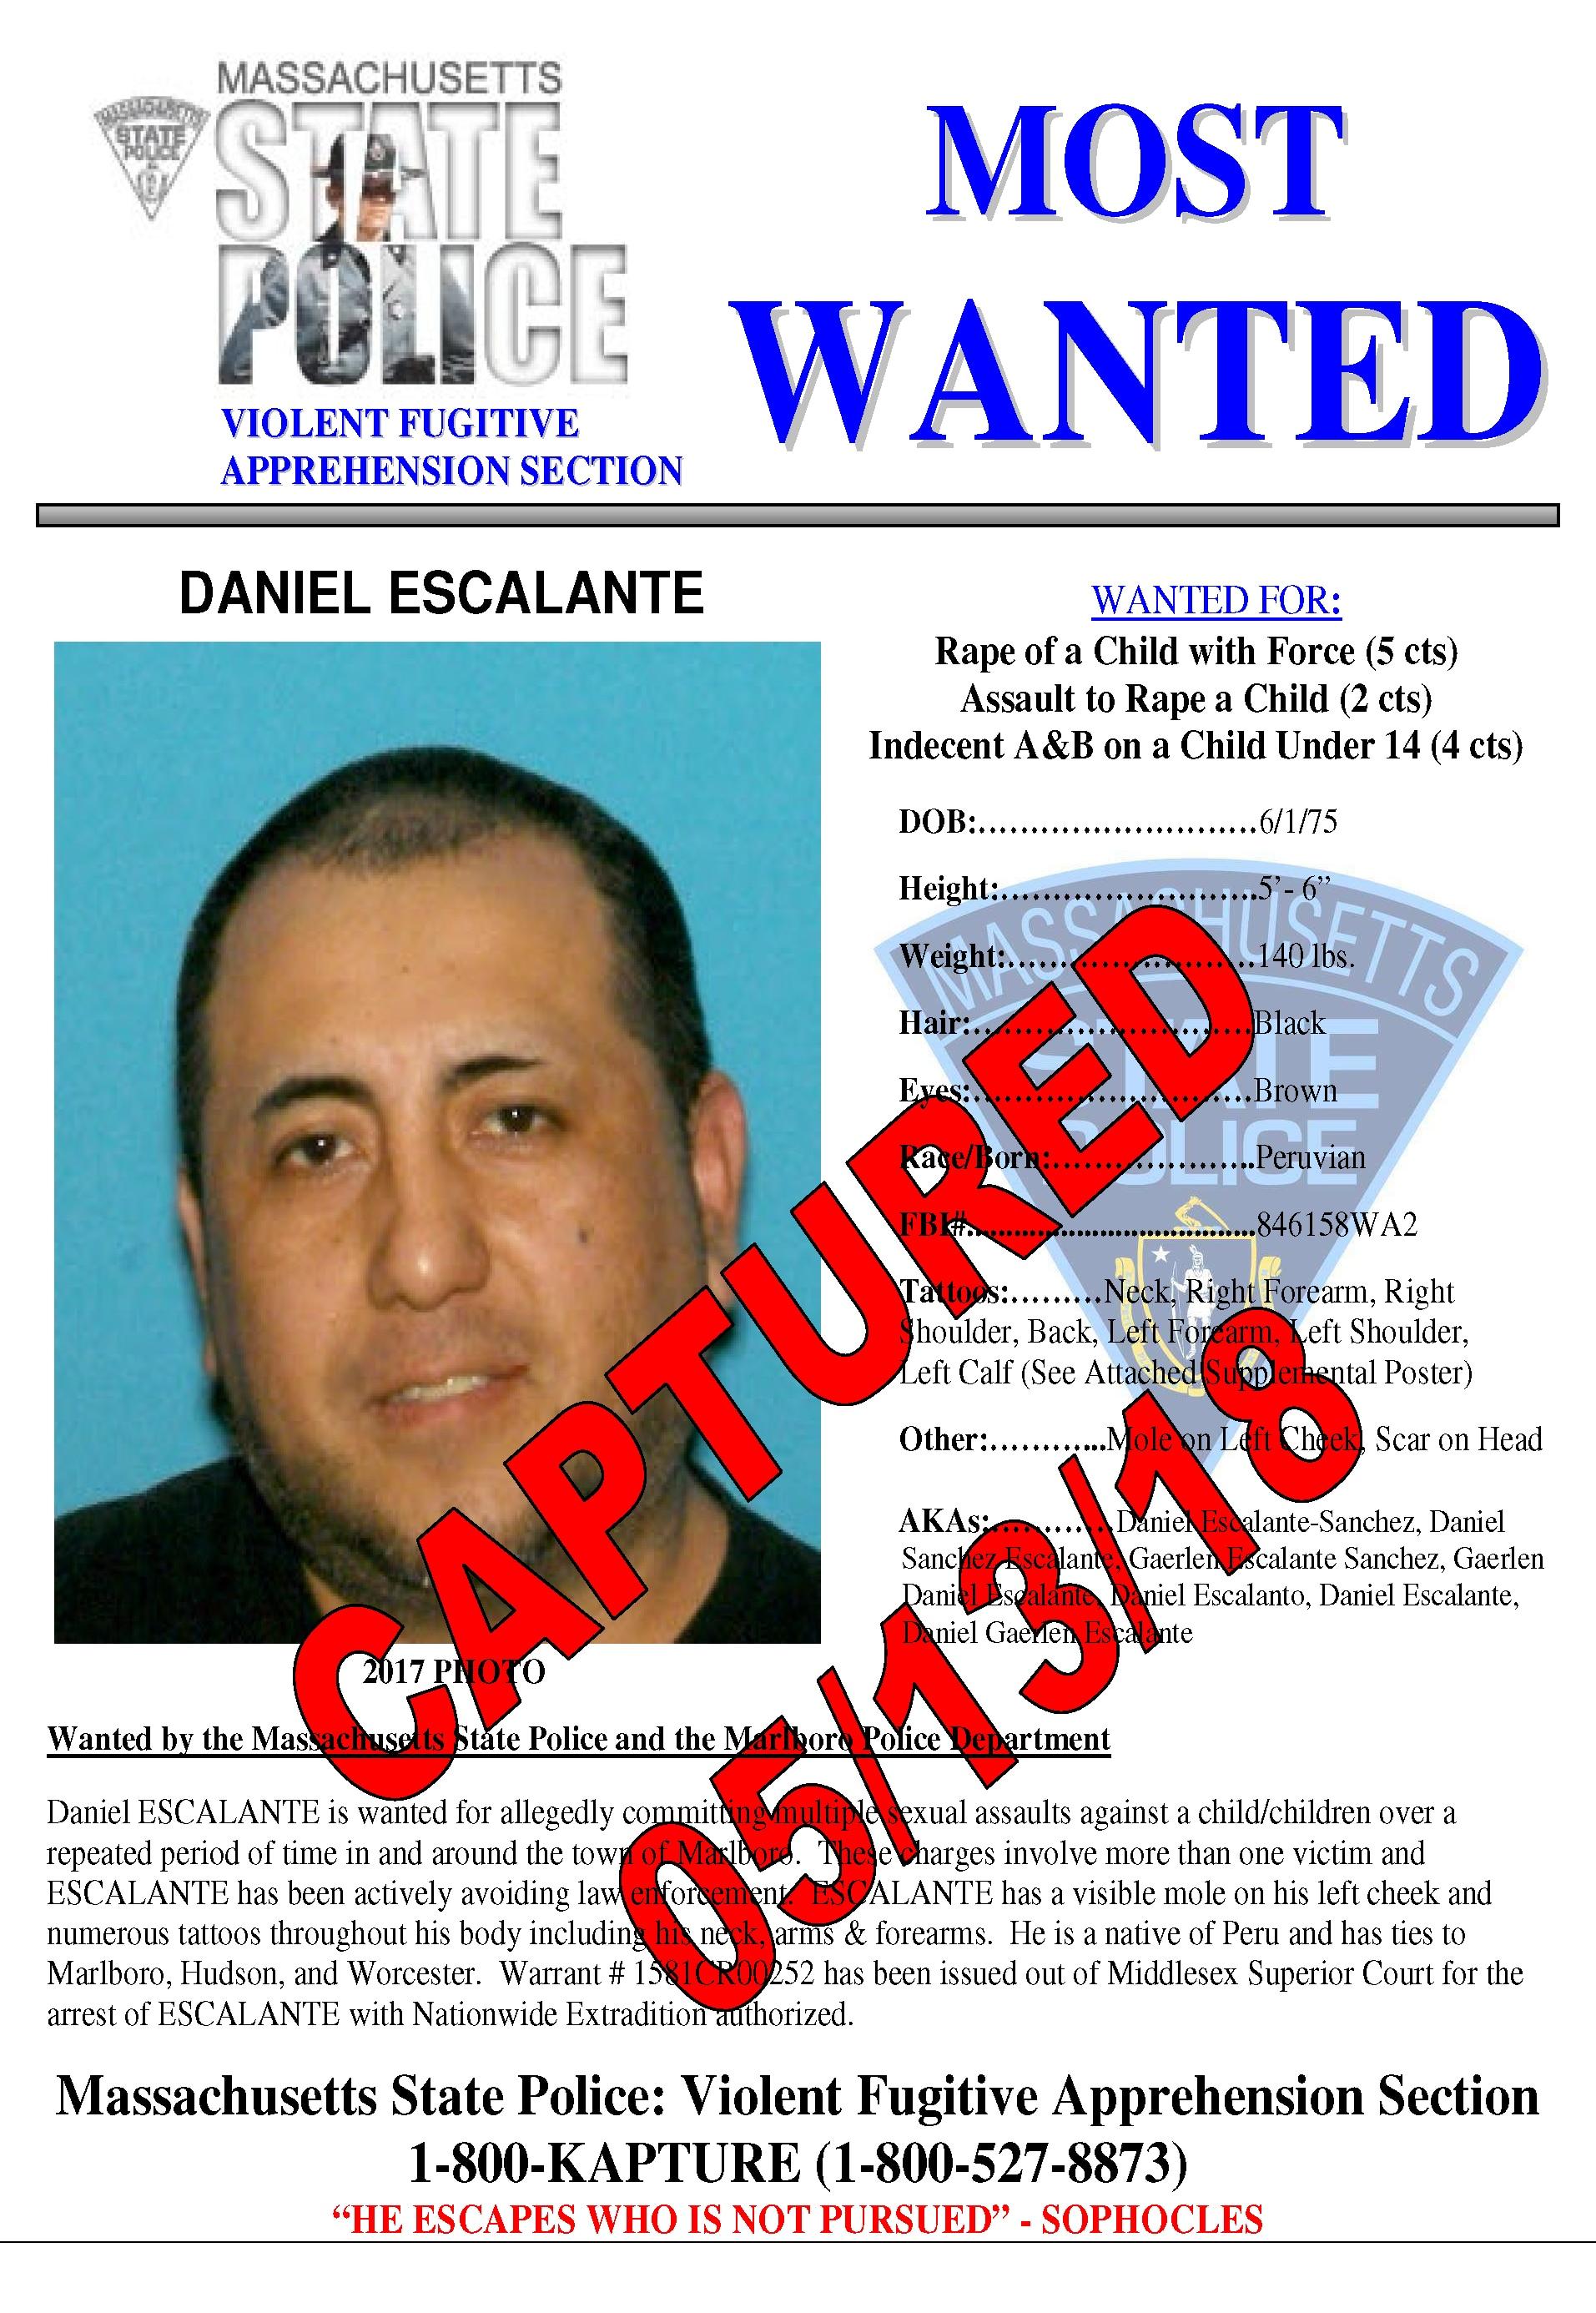 Captured Poster of Daniel Escalante Arrest